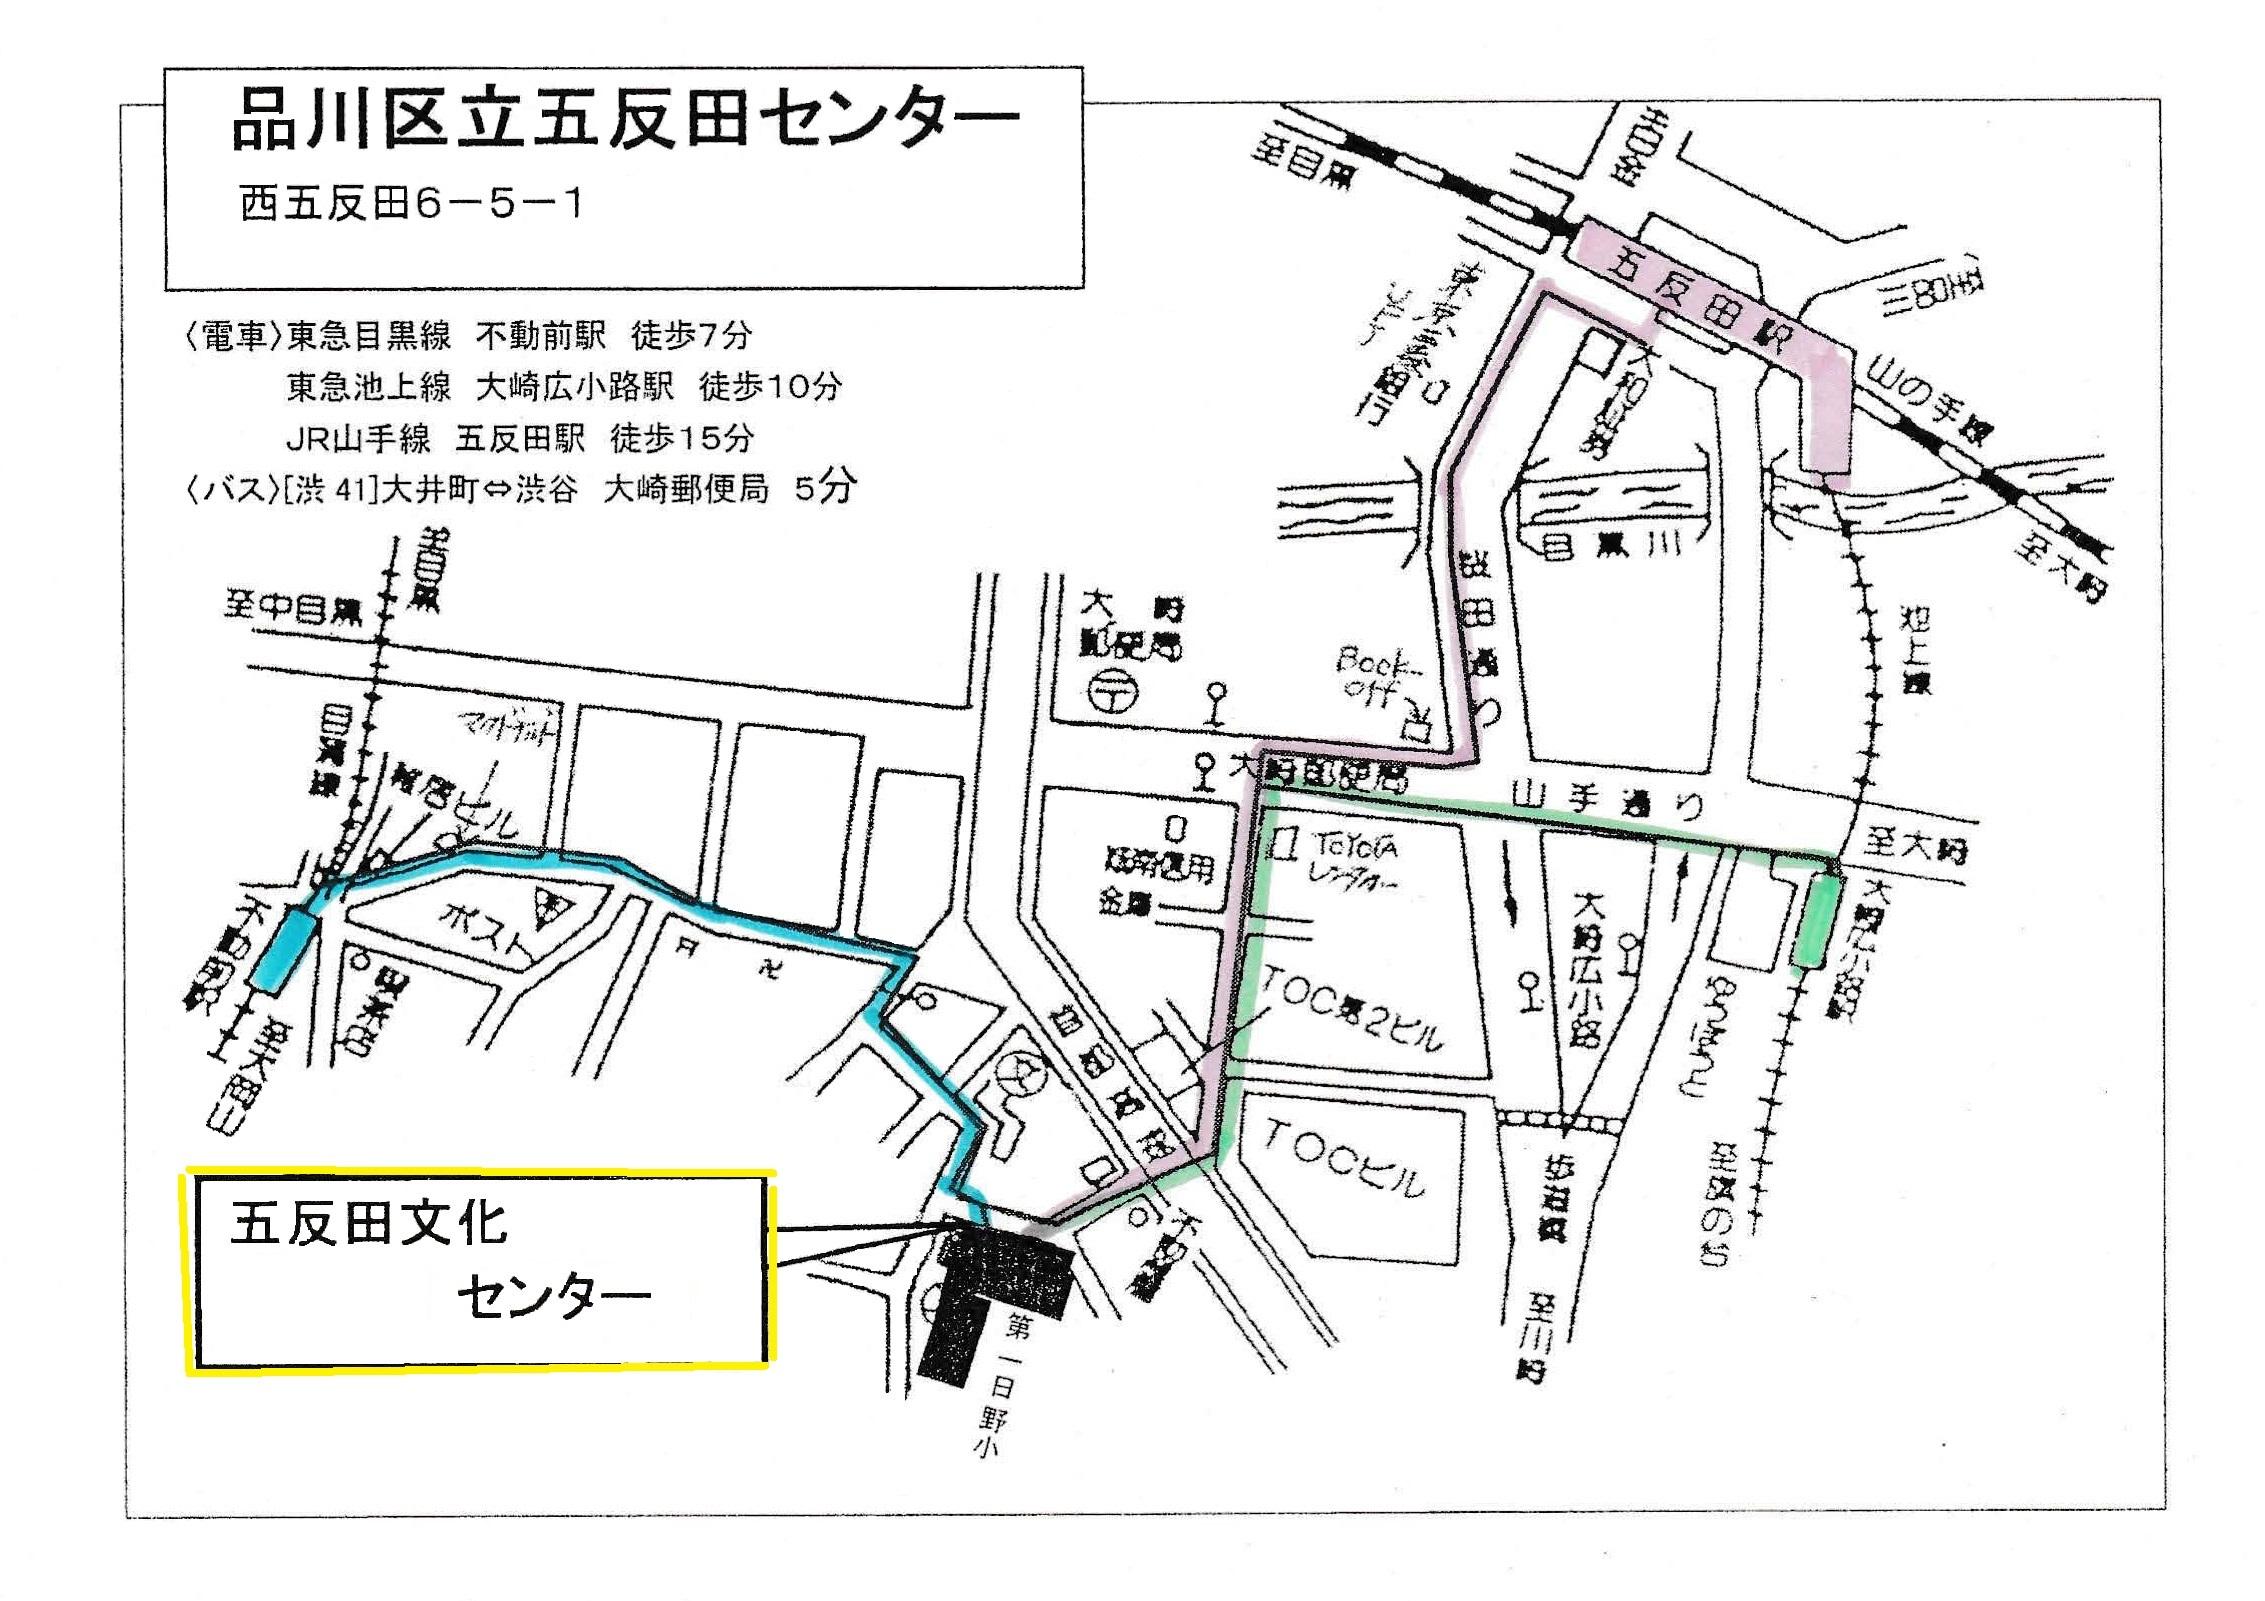 五反田文化センター地図(詳細)